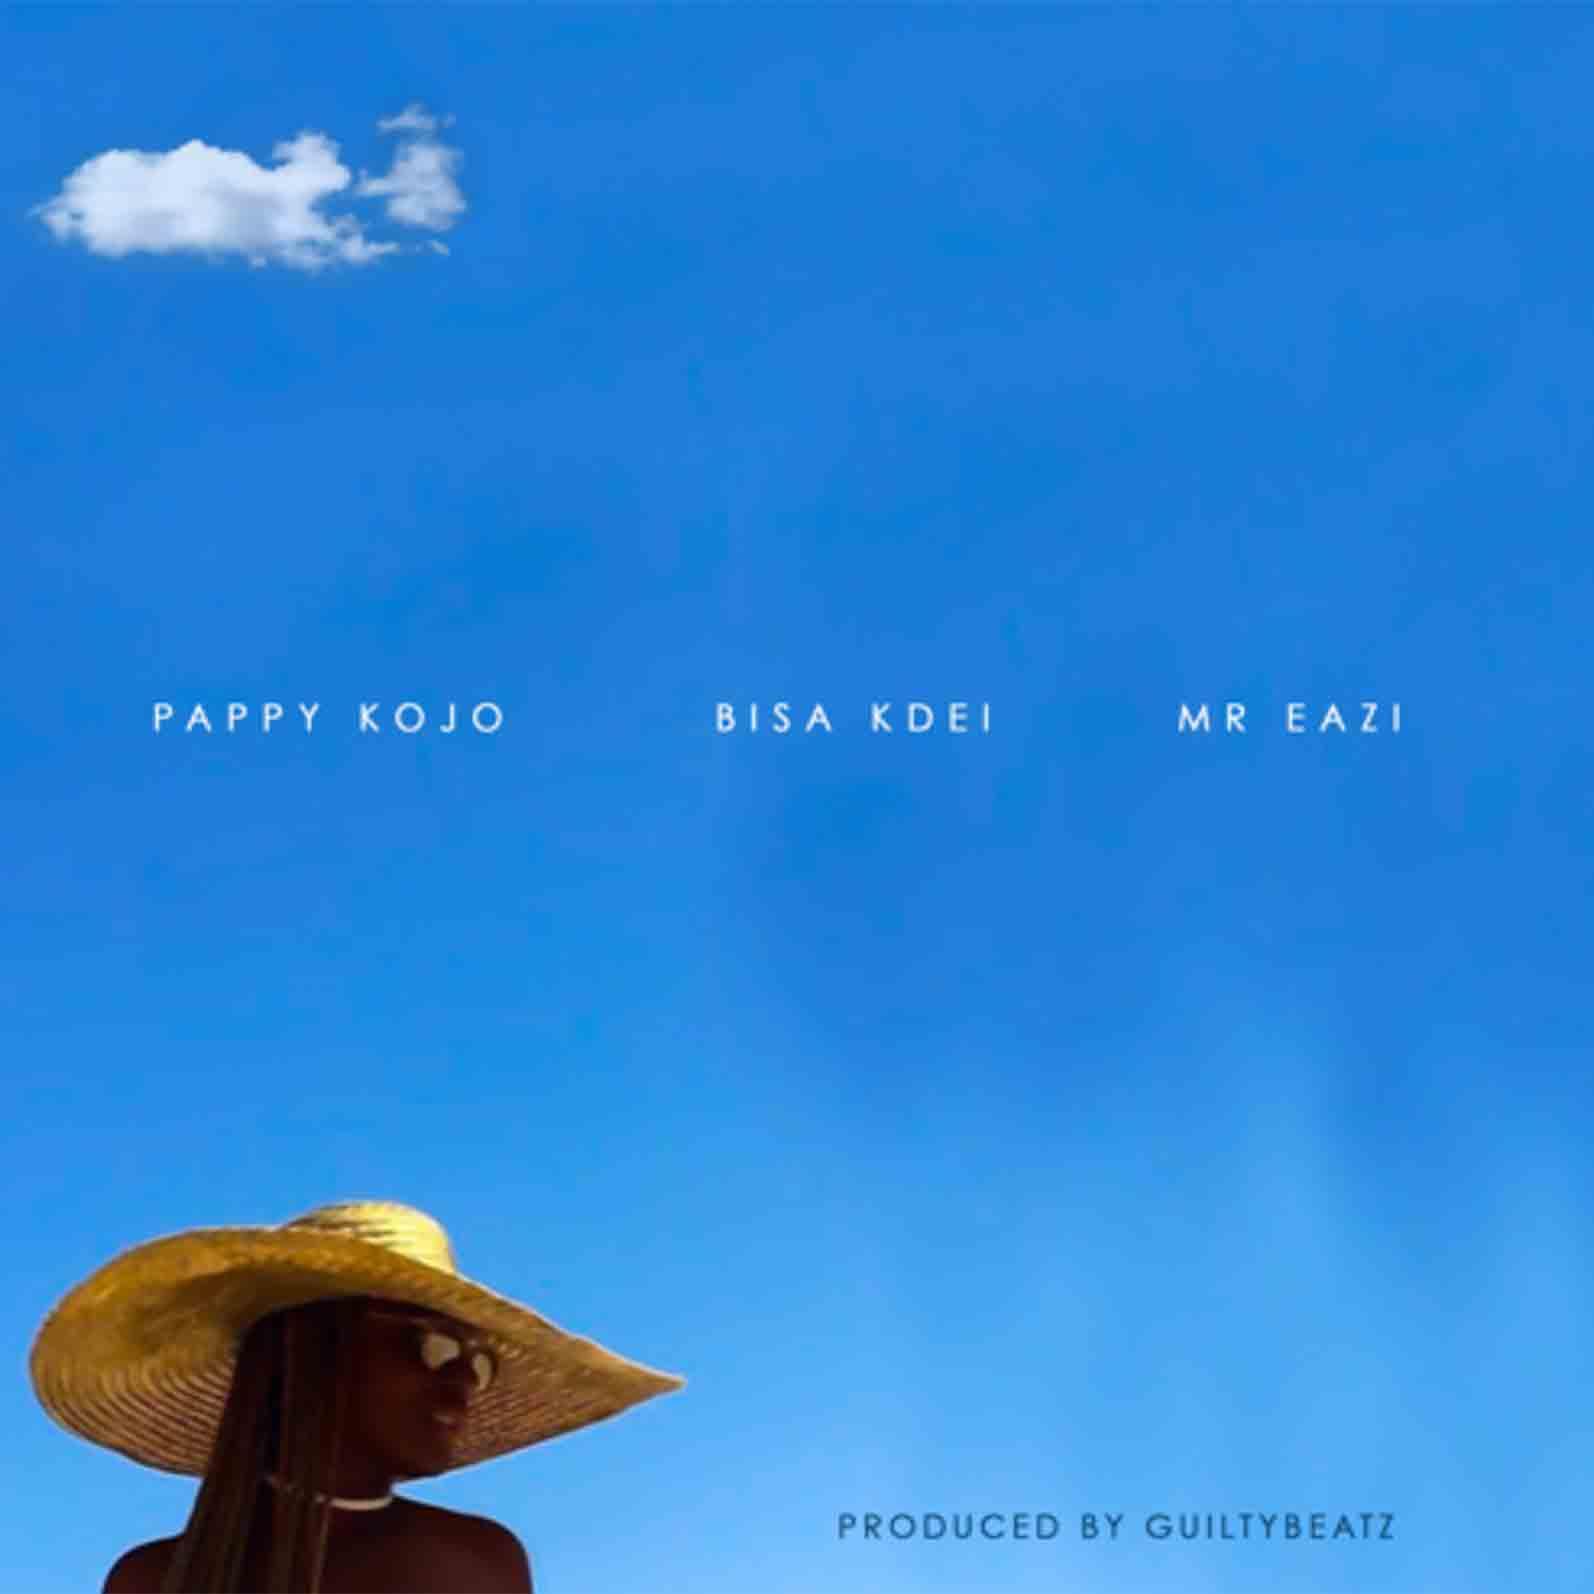 Abena by Pappy Kojo feat. Bisa Kdei & Mr. Eazi